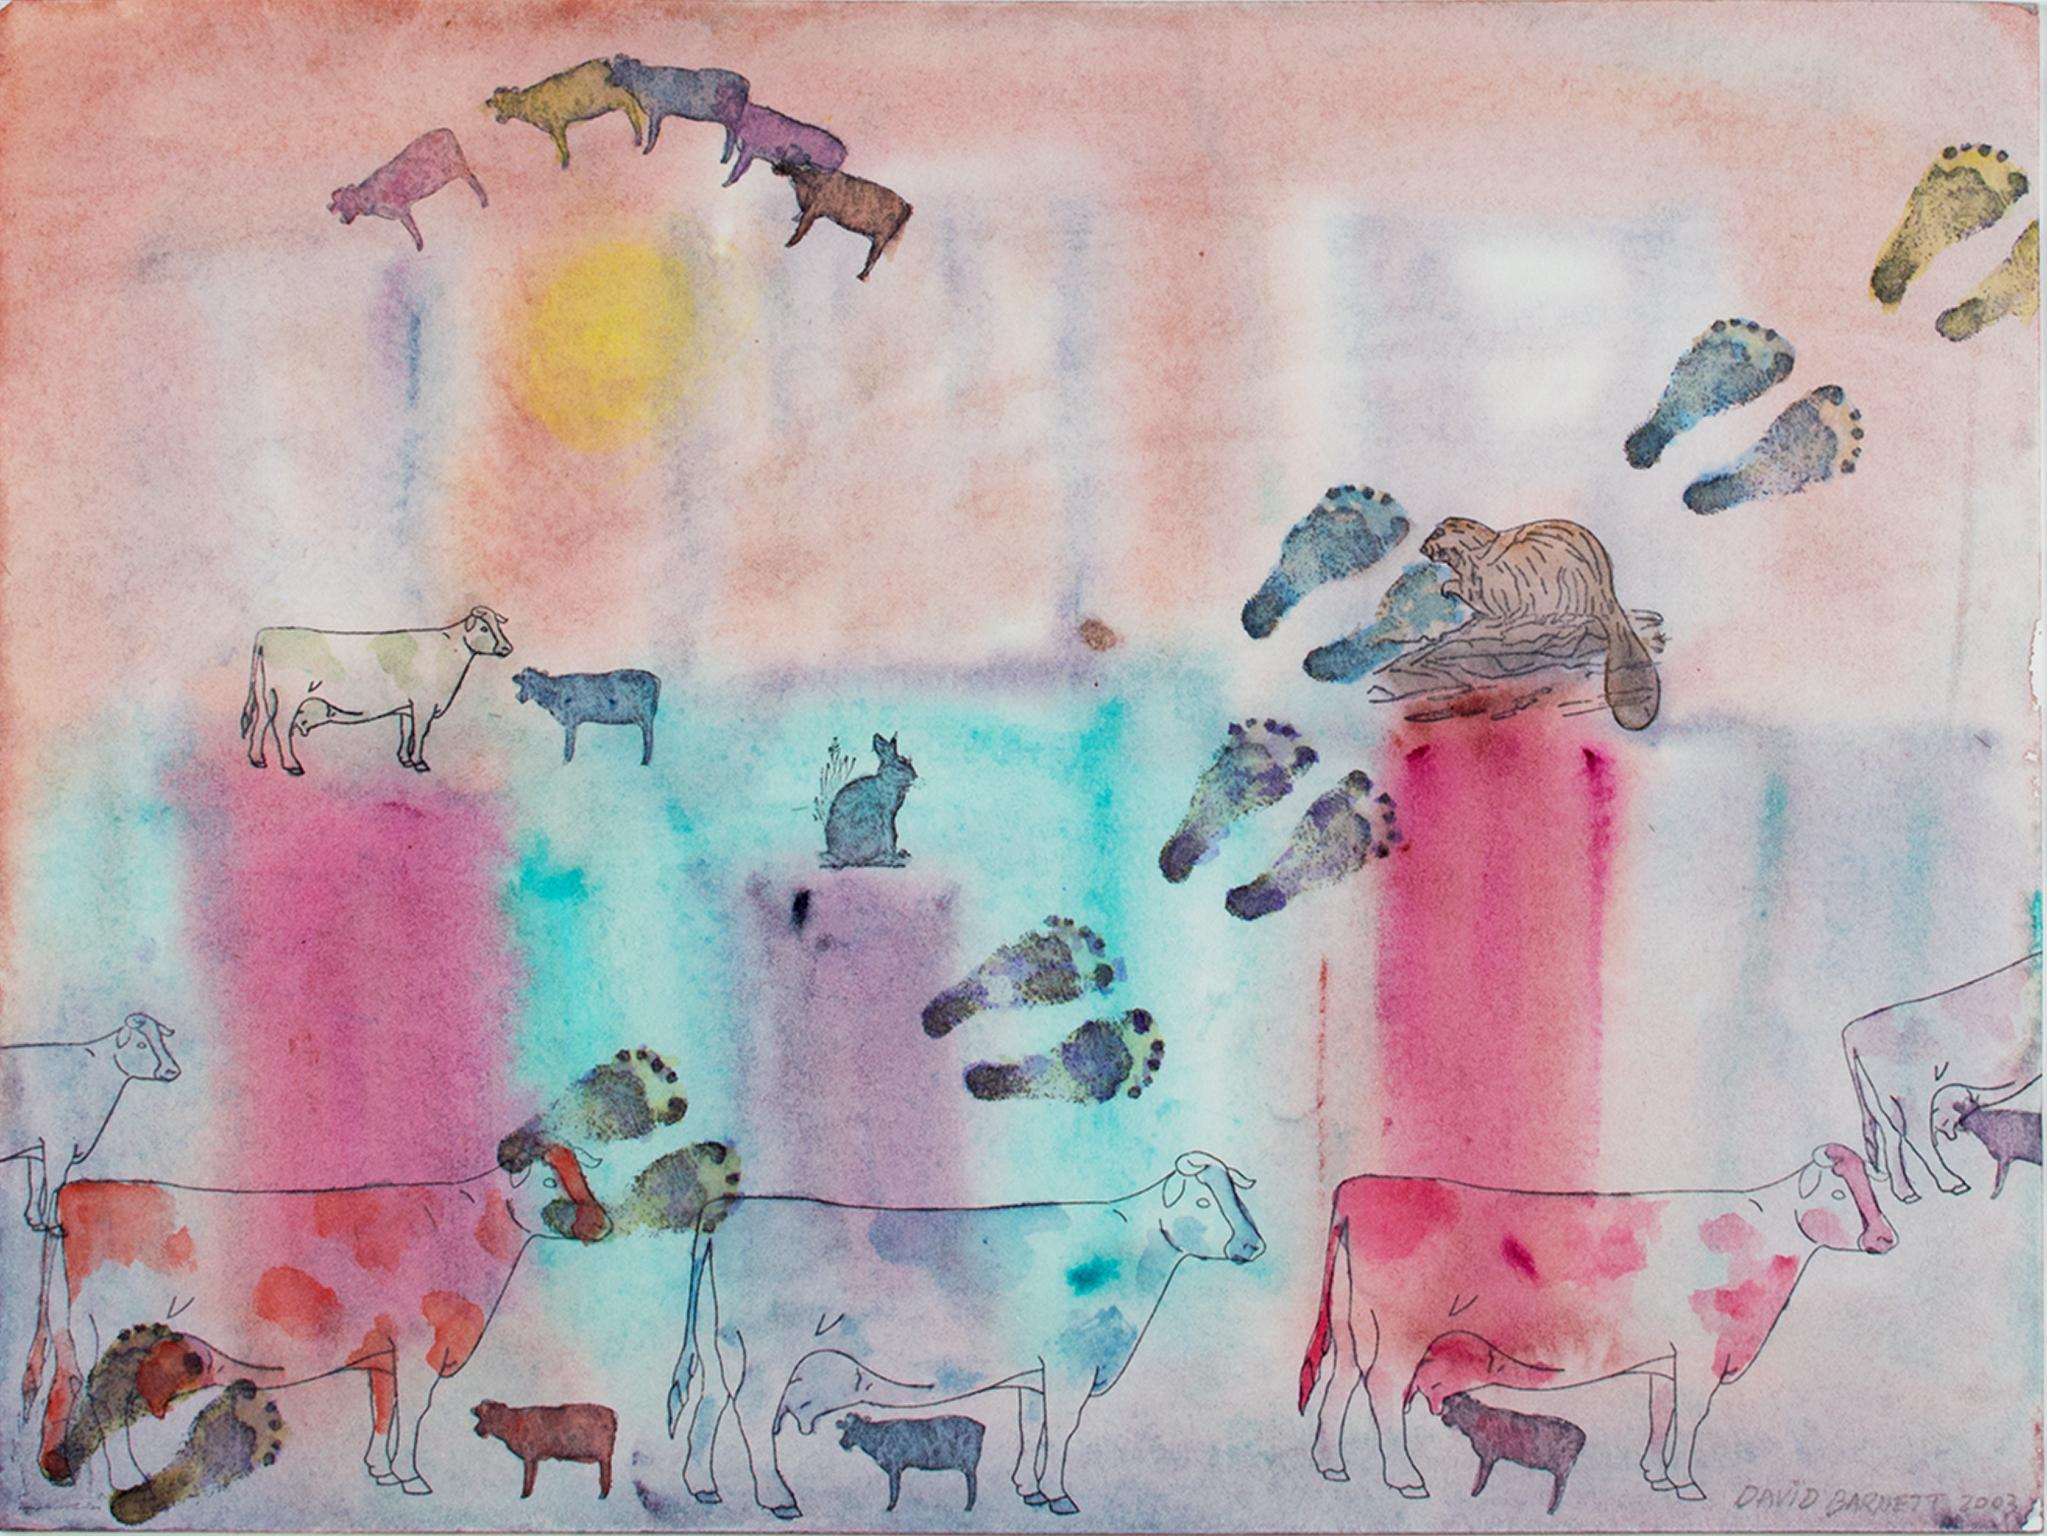 """Impressions of Mexico City: Sueno Vaca (Cows Dreaming)"" Watercolor by Barnett"